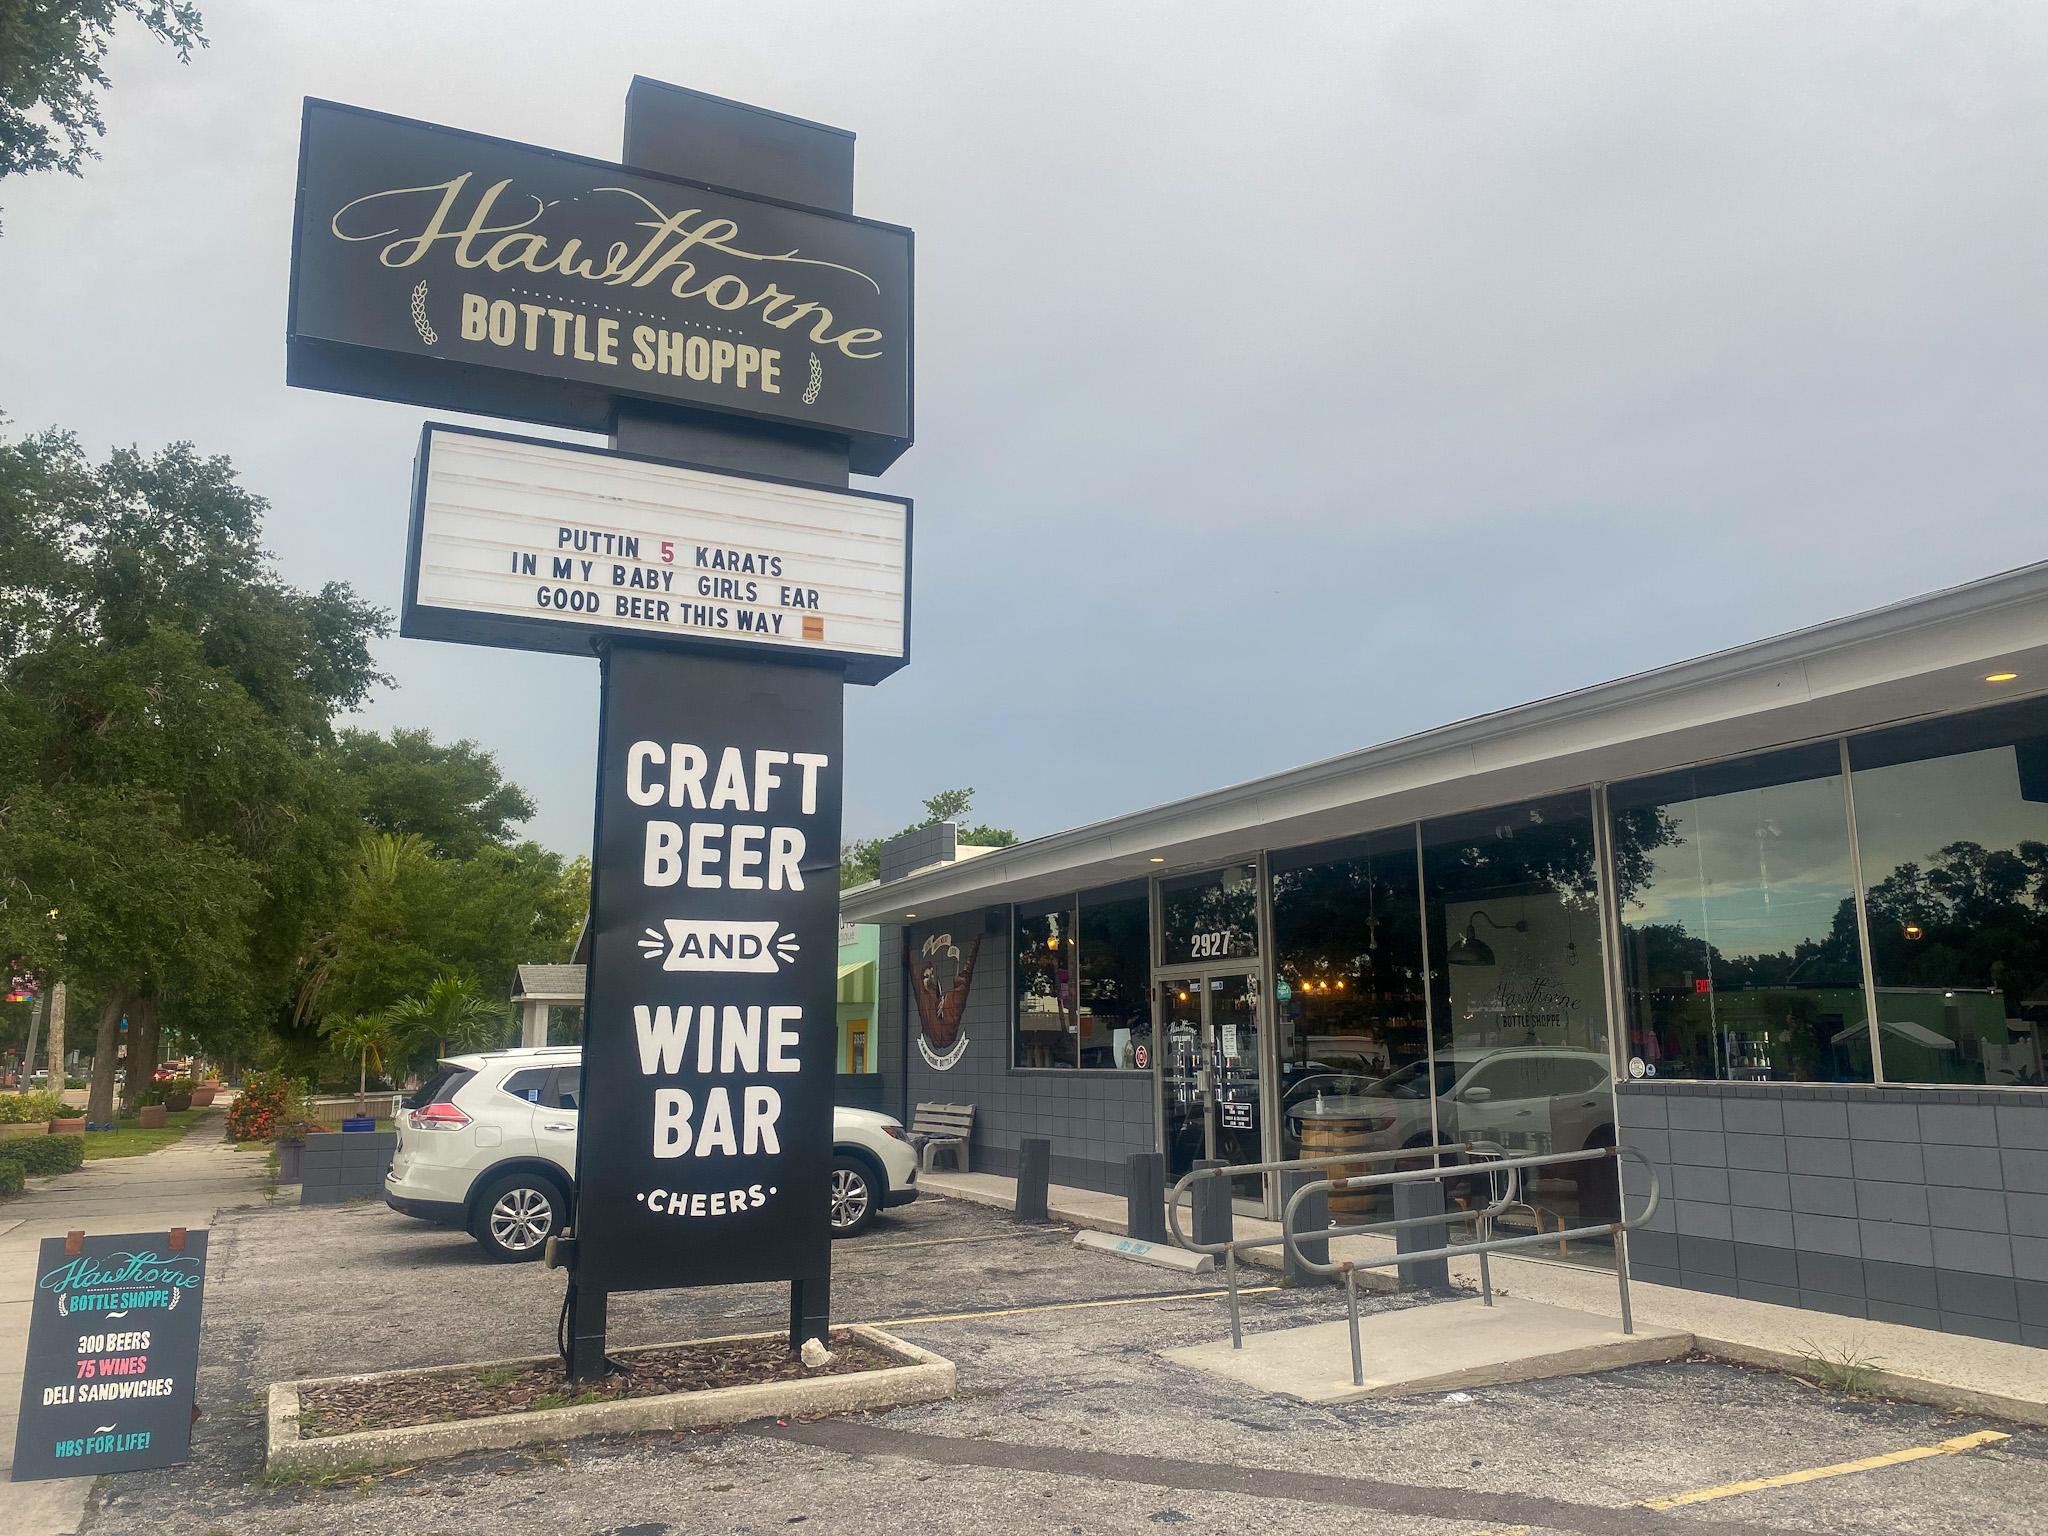 The exterior of Hawthorne Bottle Shoppe